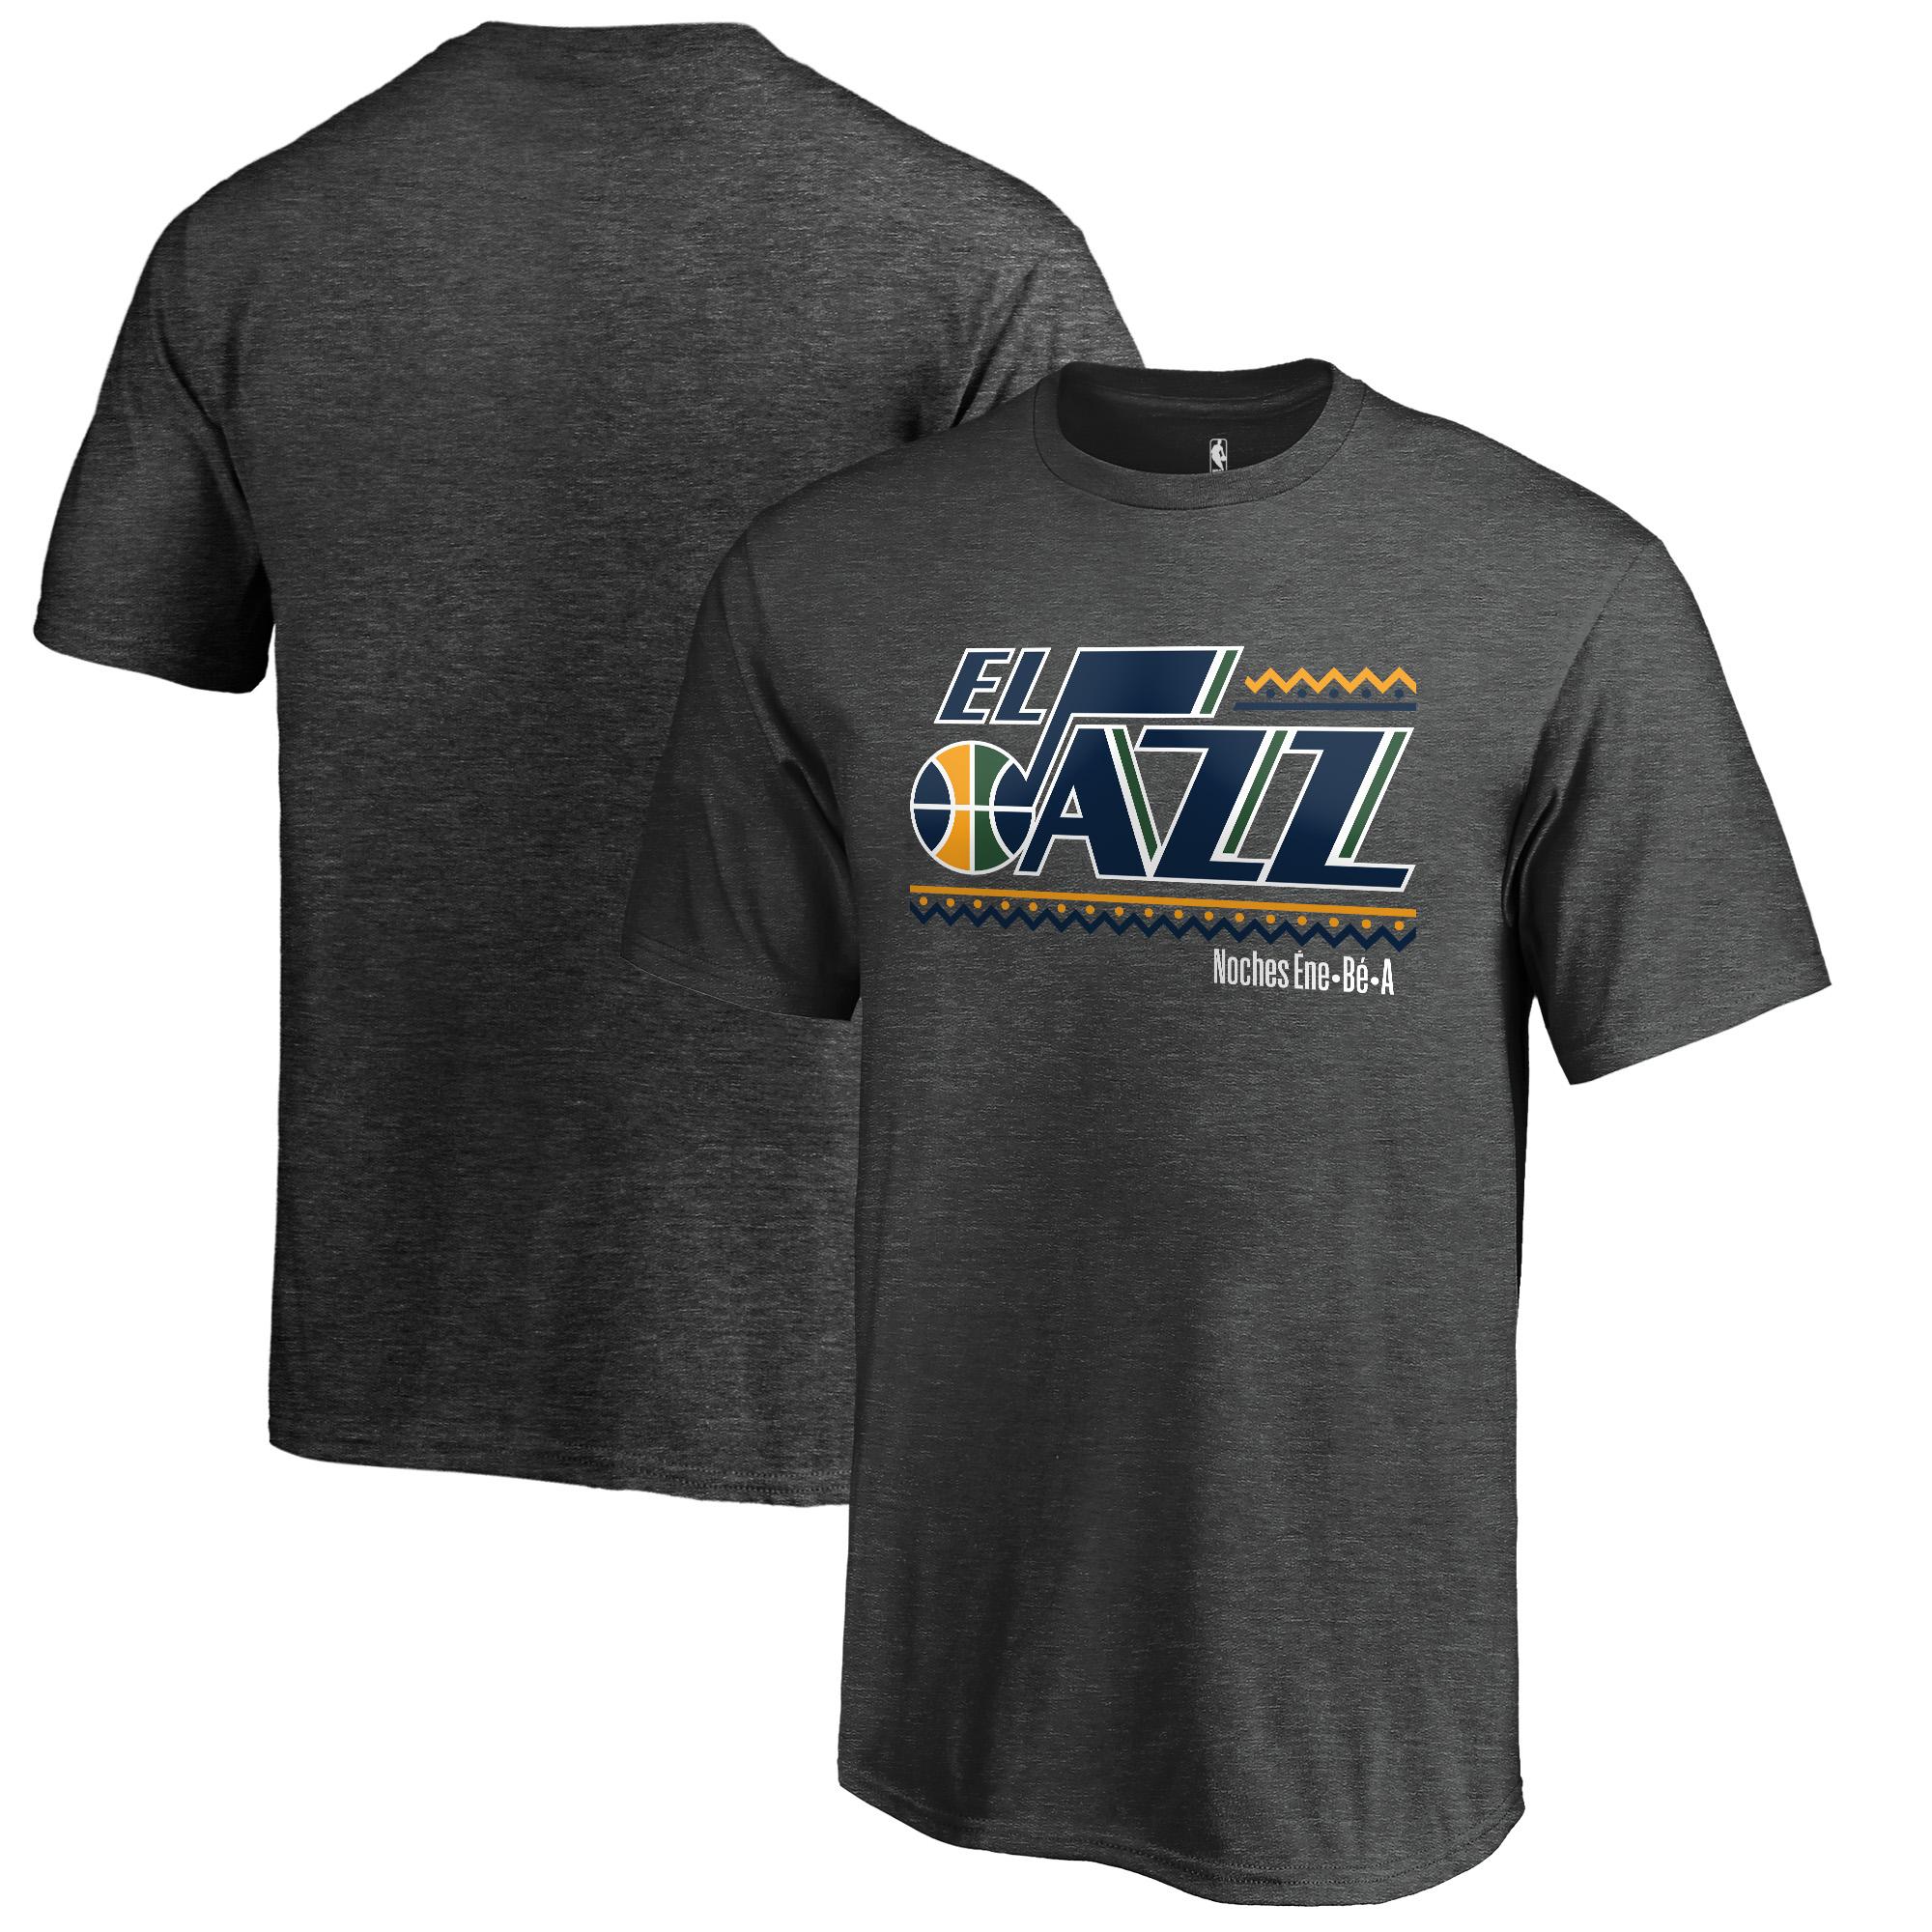 Utah Jazz Fanatics Branded Youth Noches Ene-Be-A T-Shirt - Heather Gray